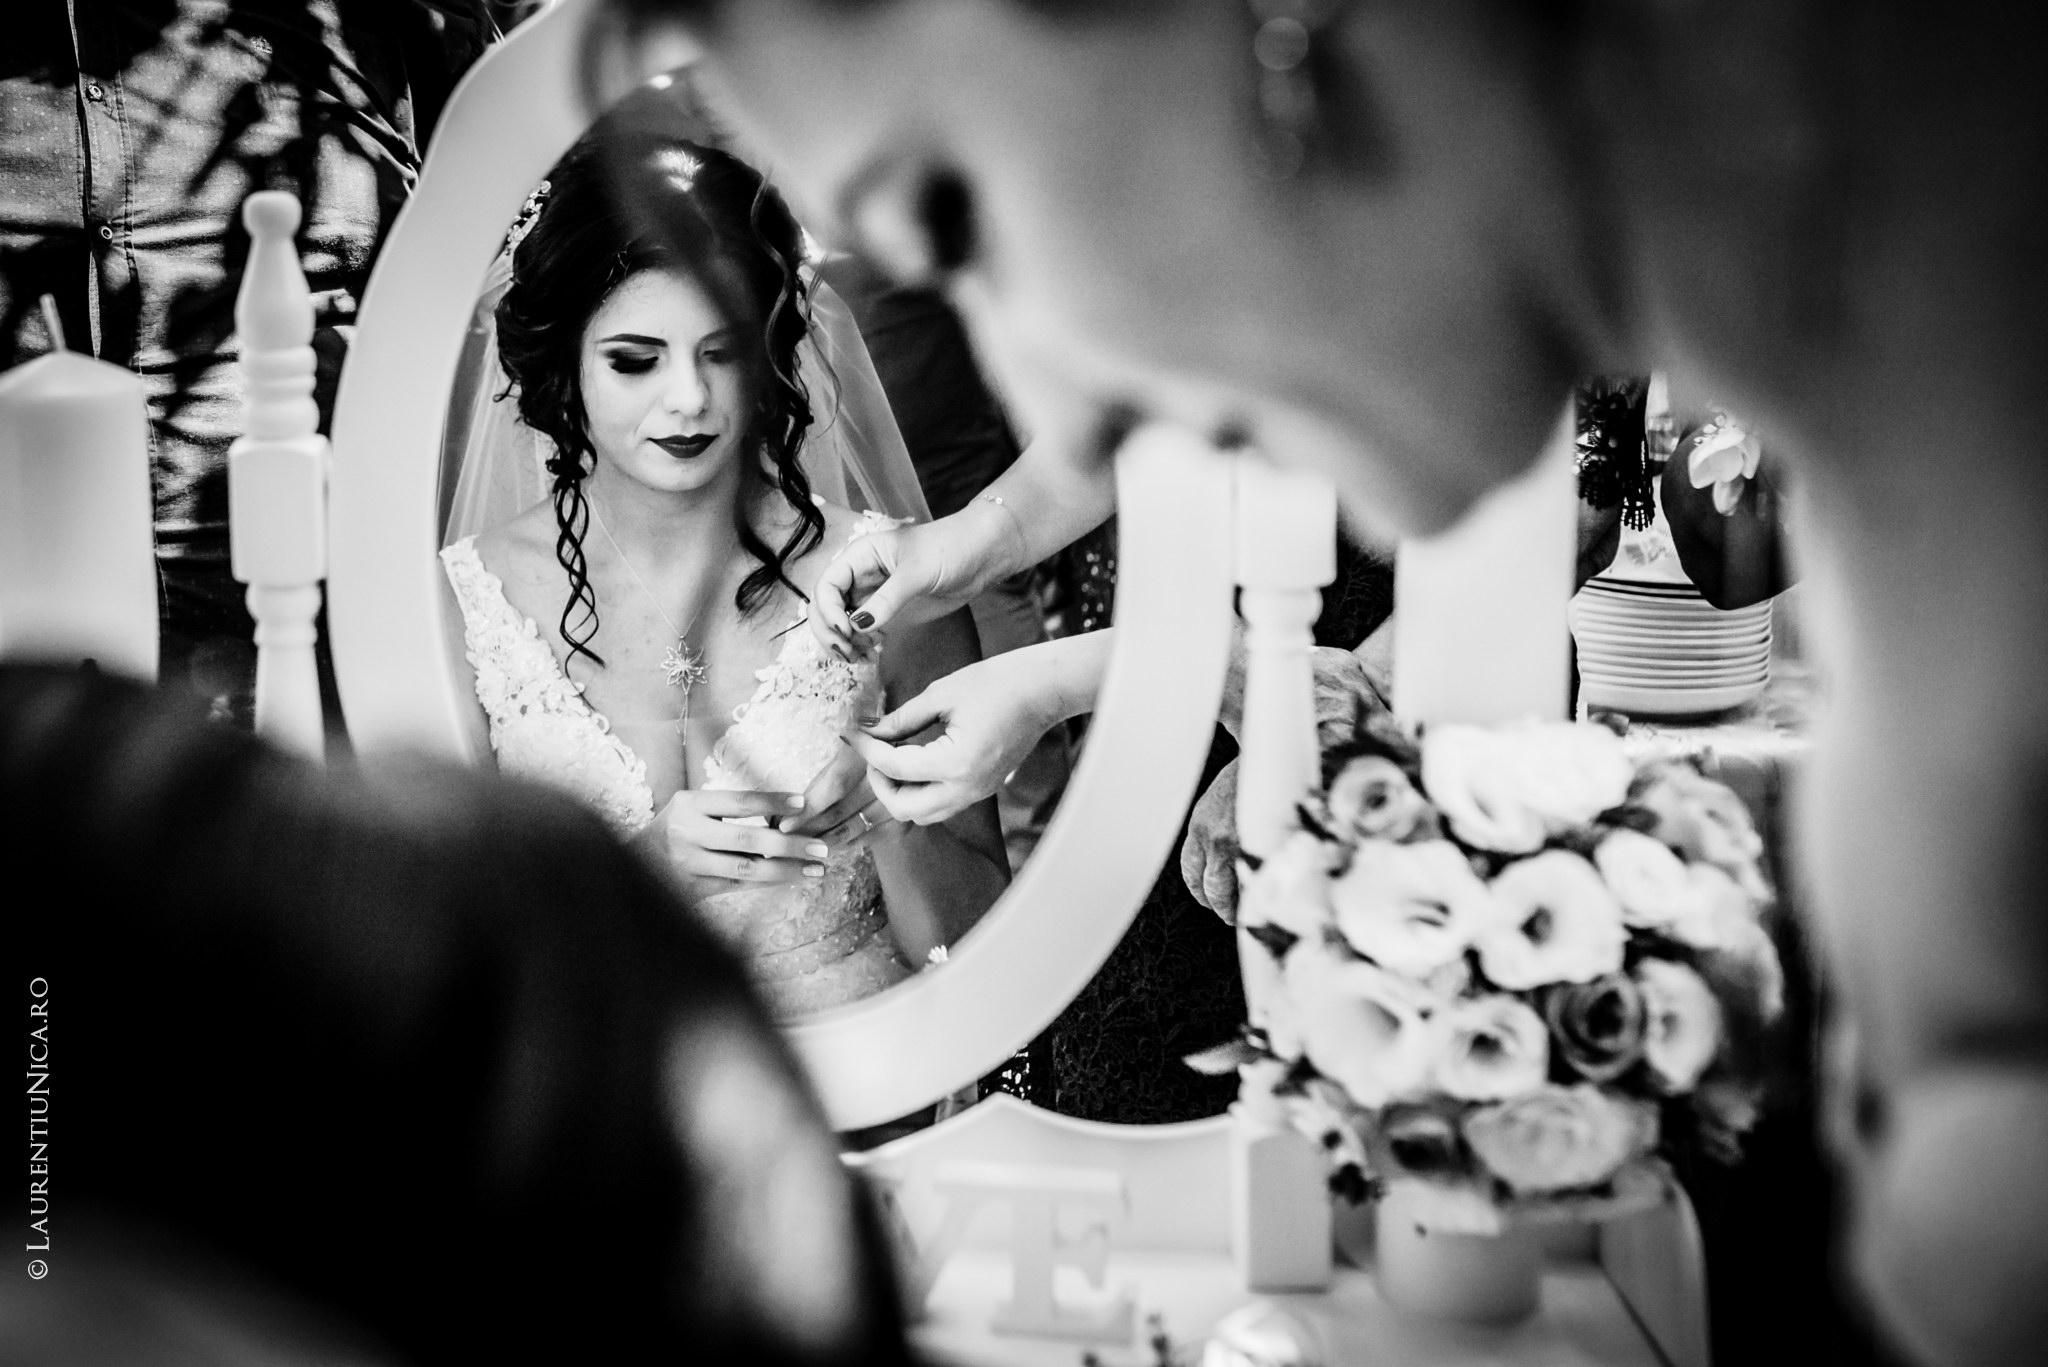 fotografii nunta craiova bia alex fotograf nunta laurentiu nica 22 - Bia & Alex | Fotografii nunta | Craiova